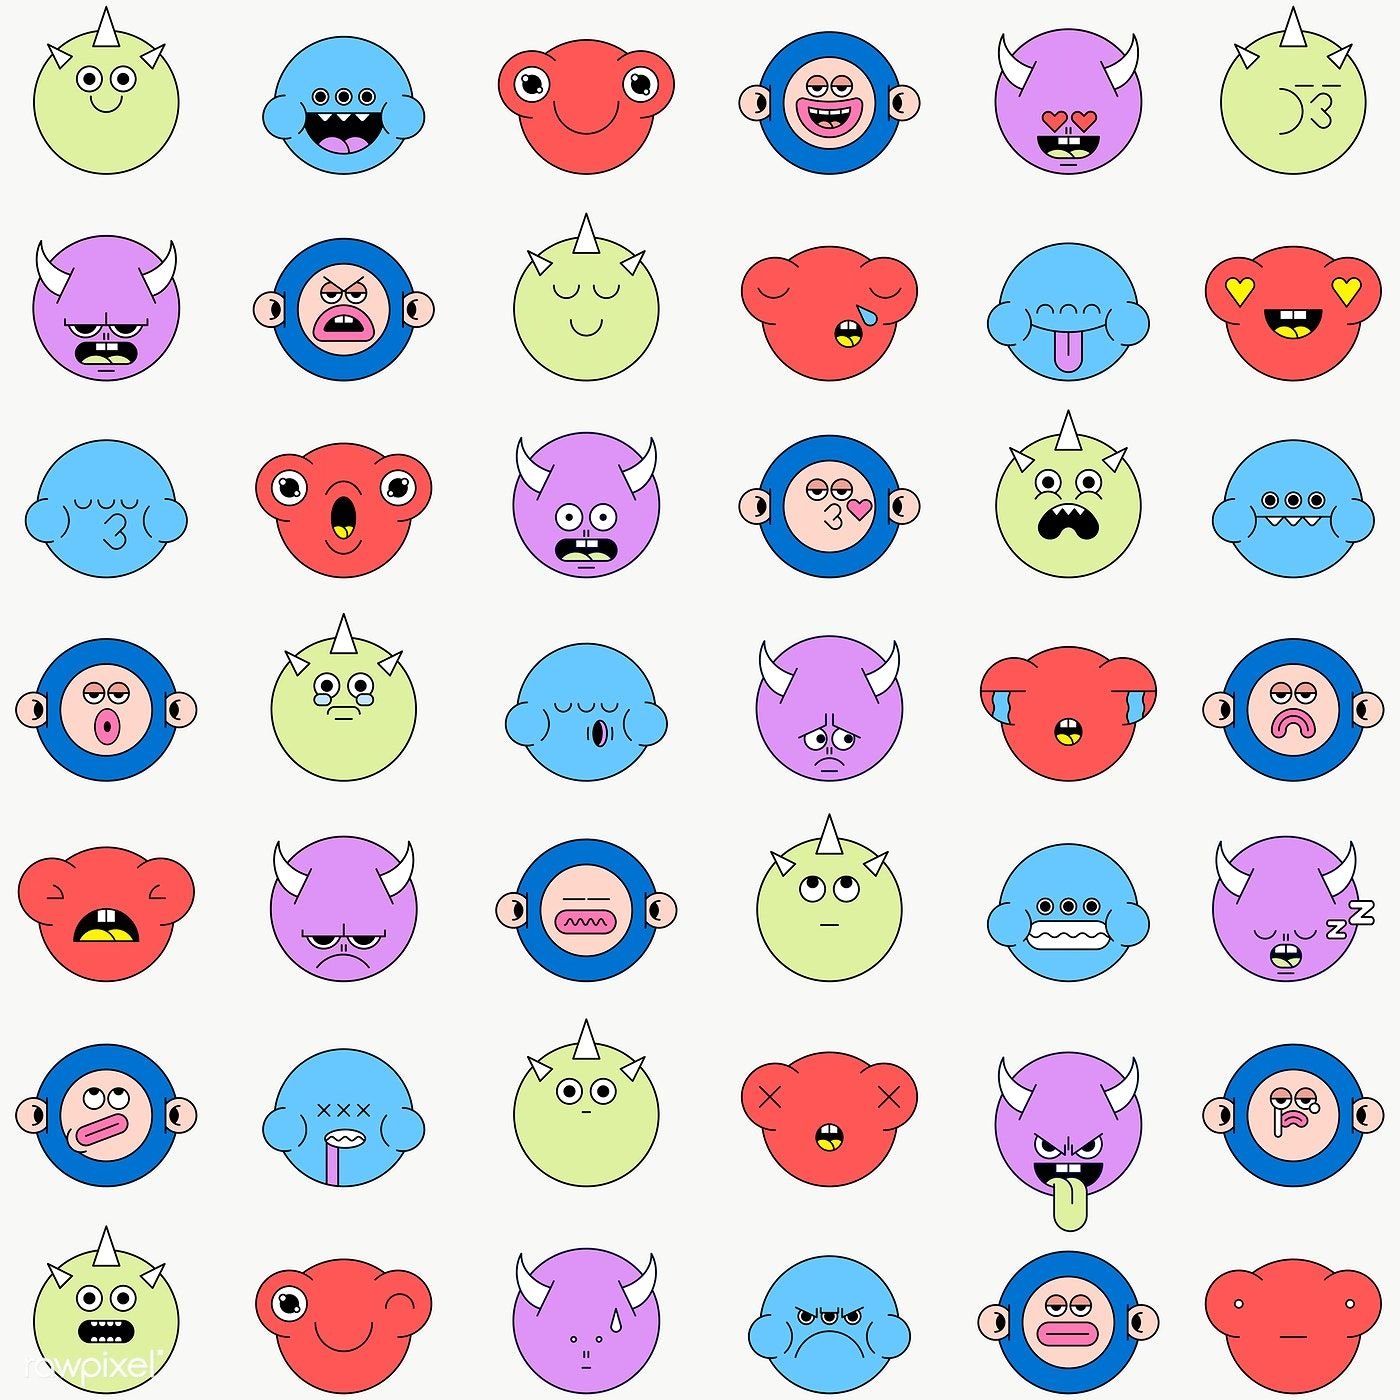 Download Premium Png Of Mixed Funky Monster Emoji Stickers Set Transparent Emoji Stickers Sticker Set Emoticon Stickers